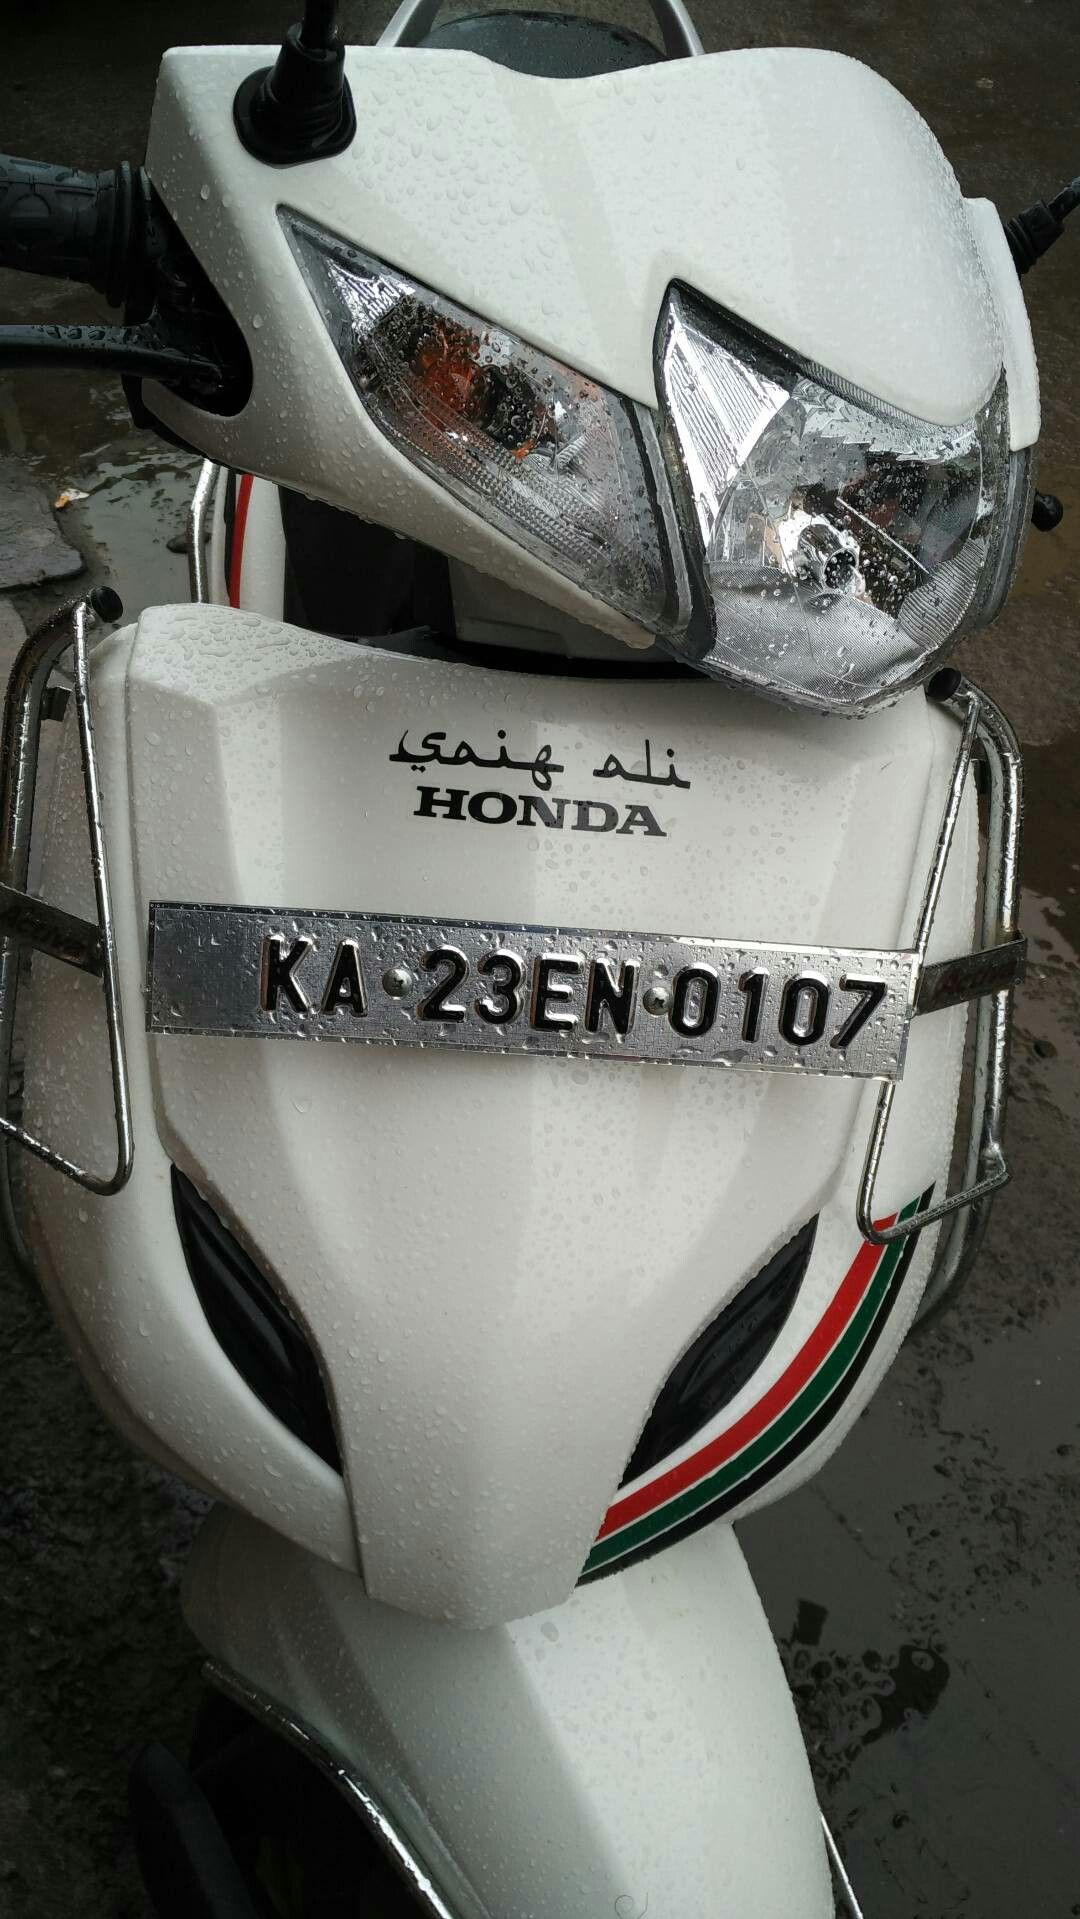 Honda activa 3g modified